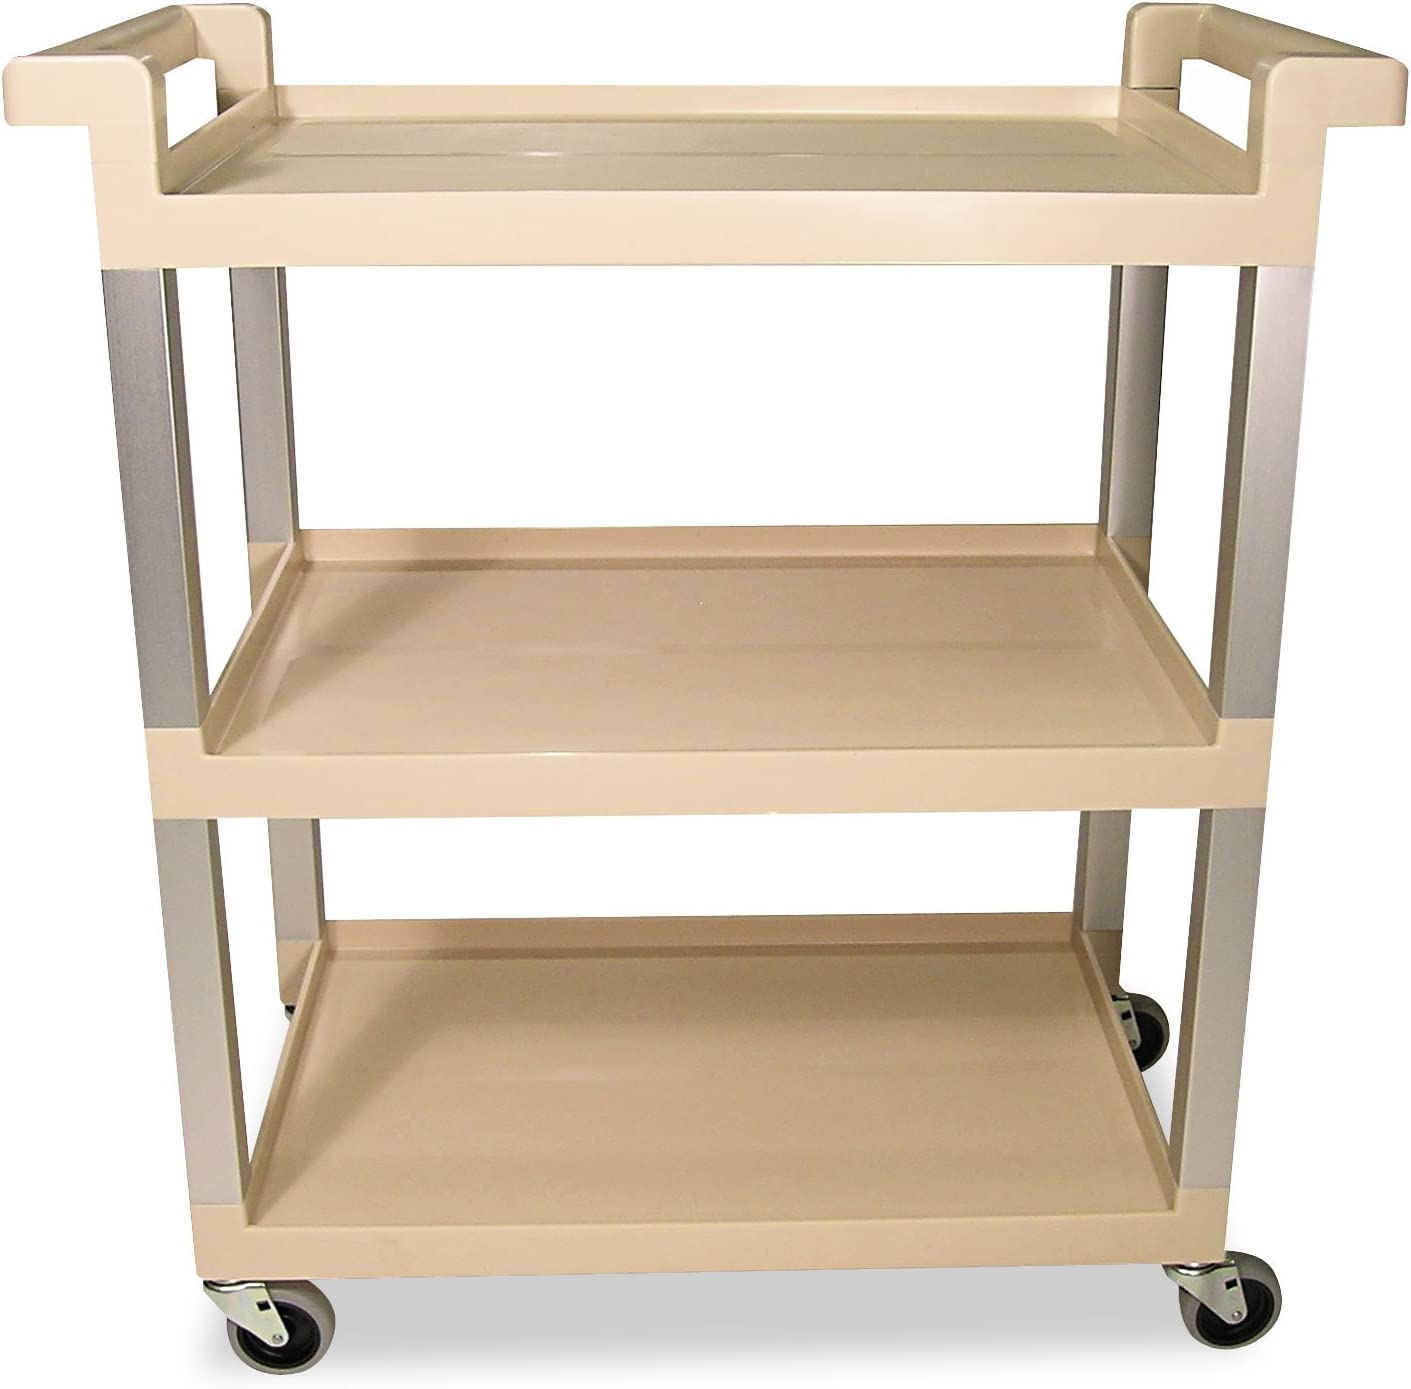 Rubbermaid 9T6571BG Very popular Ranking TOP19 Three-Shelf Service Brushed w Cart Aluminum